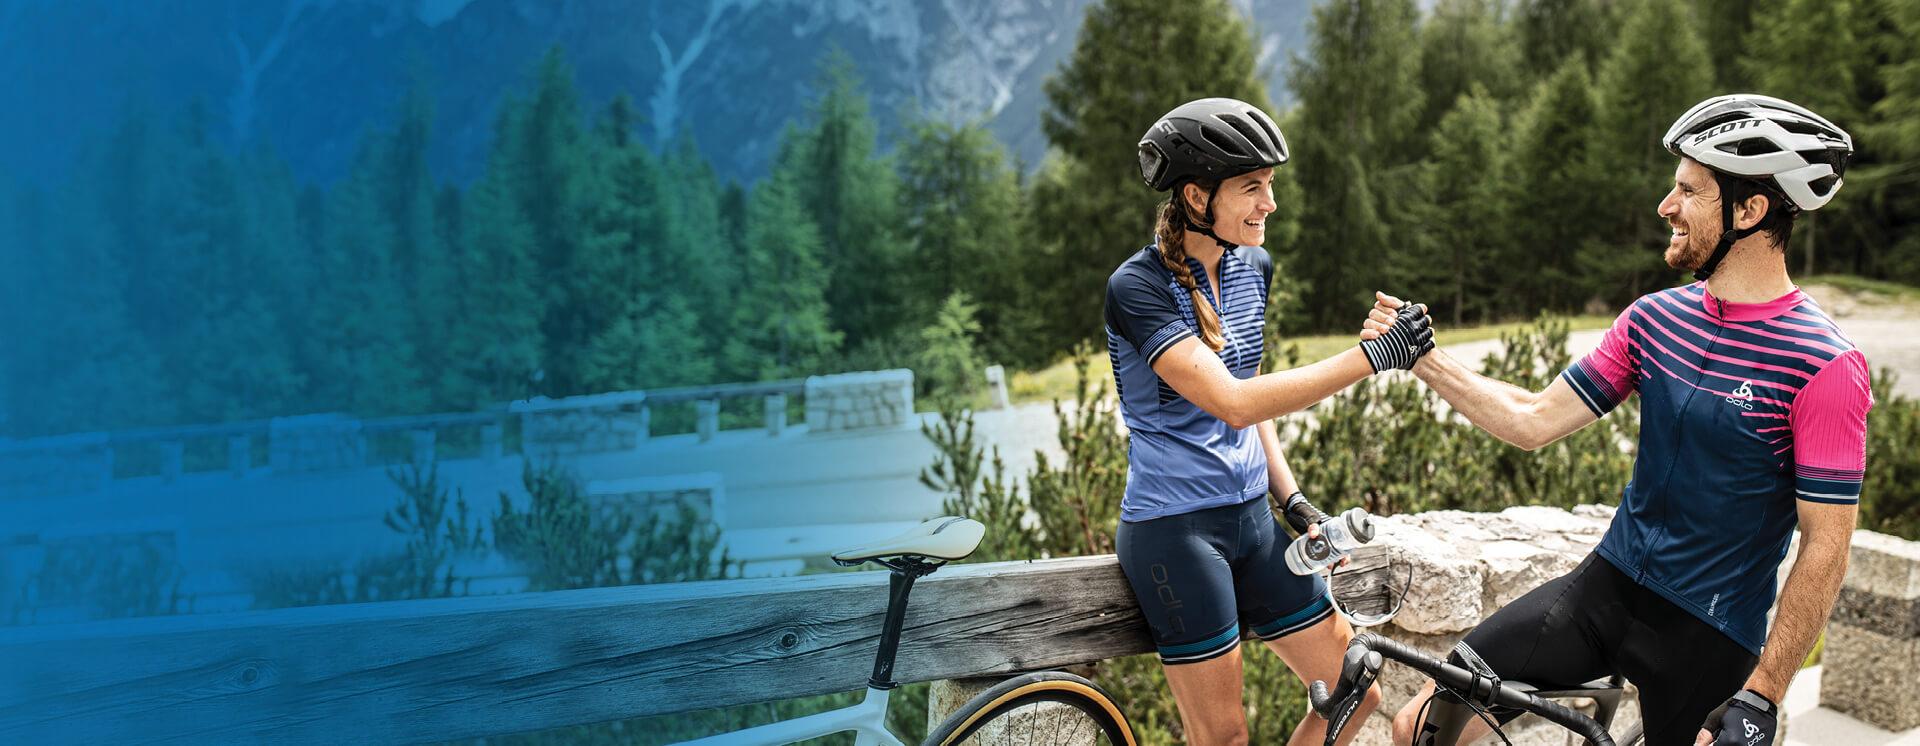 Men & Women Cycling & MTB collection